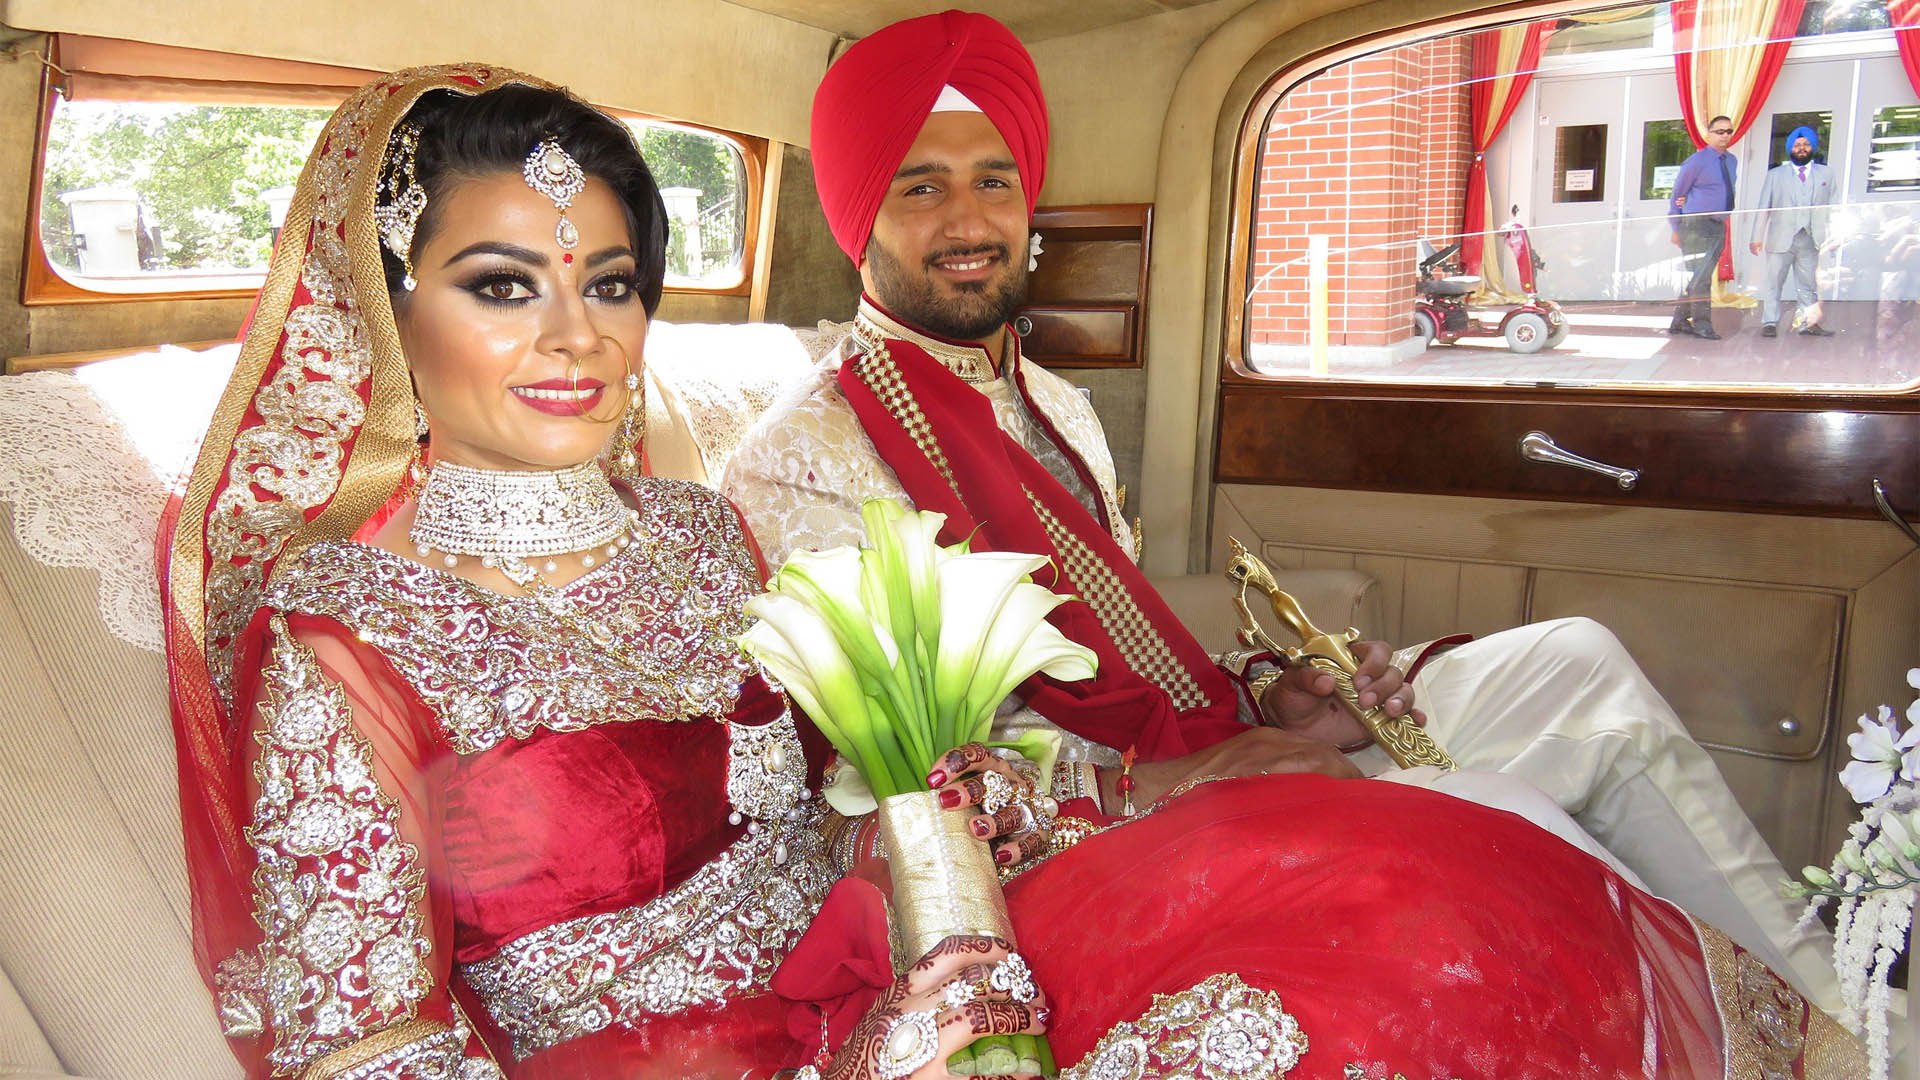 vintage-wedding-car-rental-vancouver-bride-groom-2